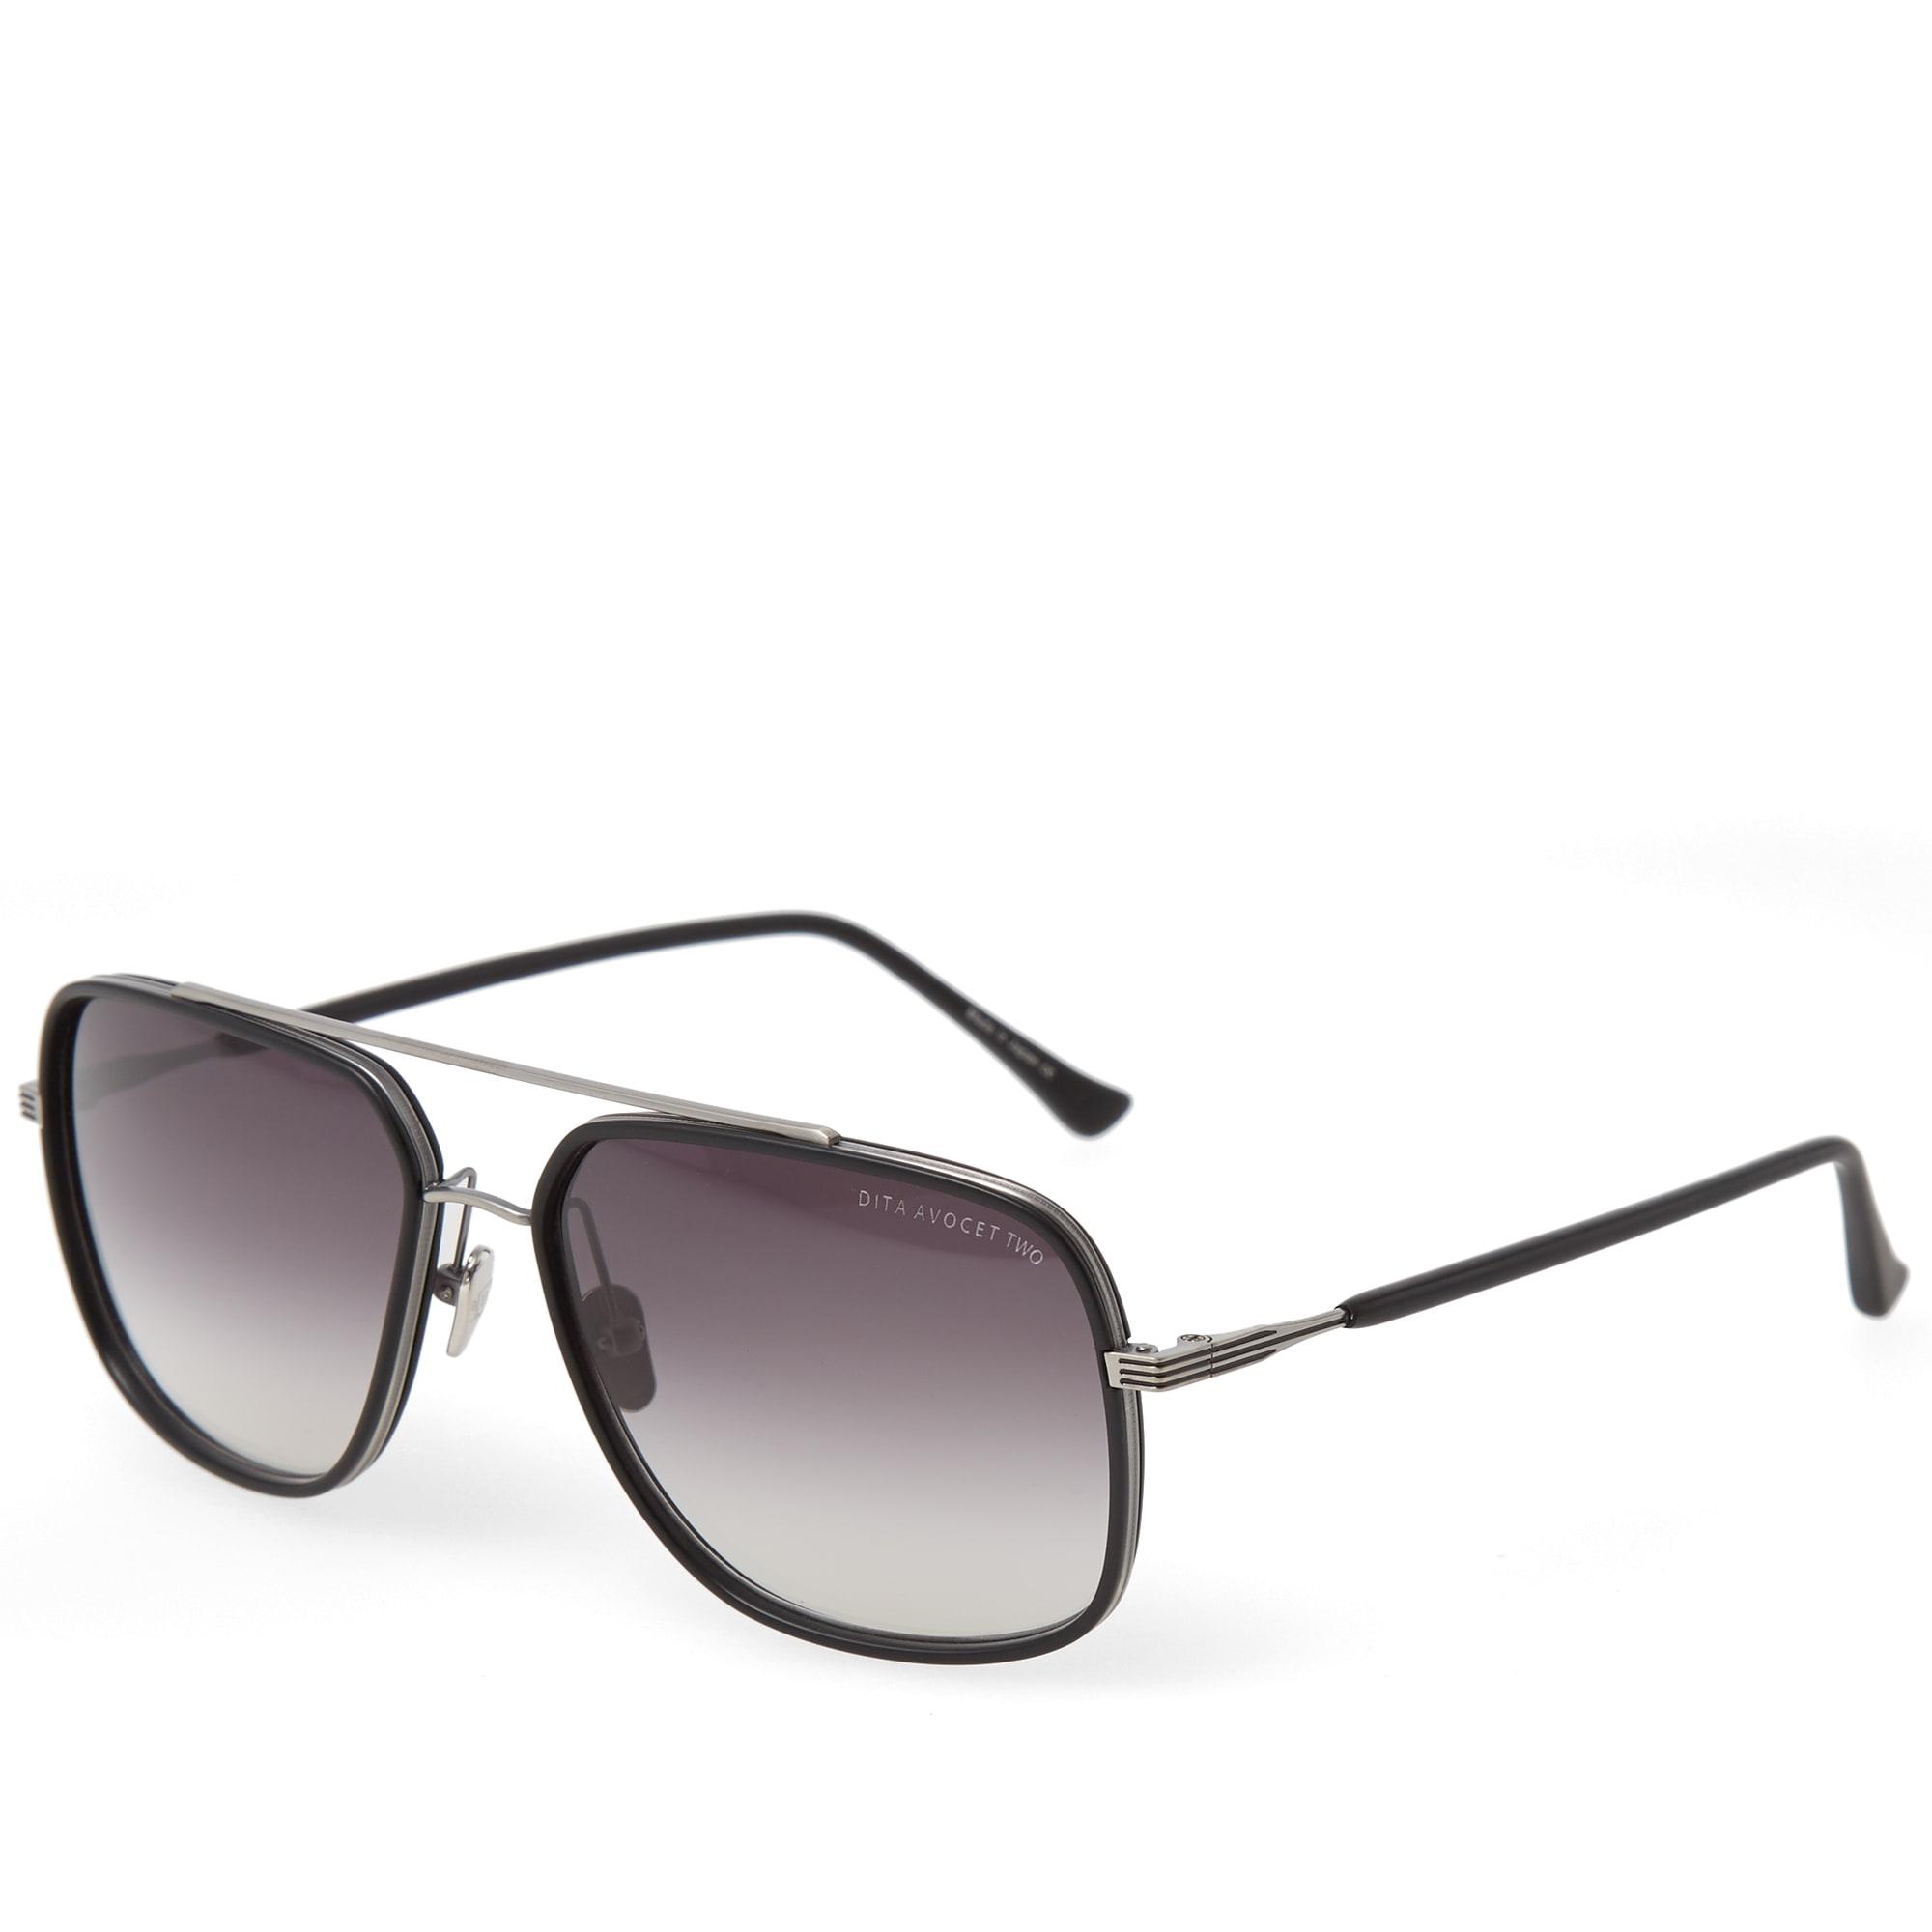 11c94cdb83b4 Dita Sunglasses Replica Malaysia. DITA MACH ONE TITANIUM BLACK   GOLD DRX  ...